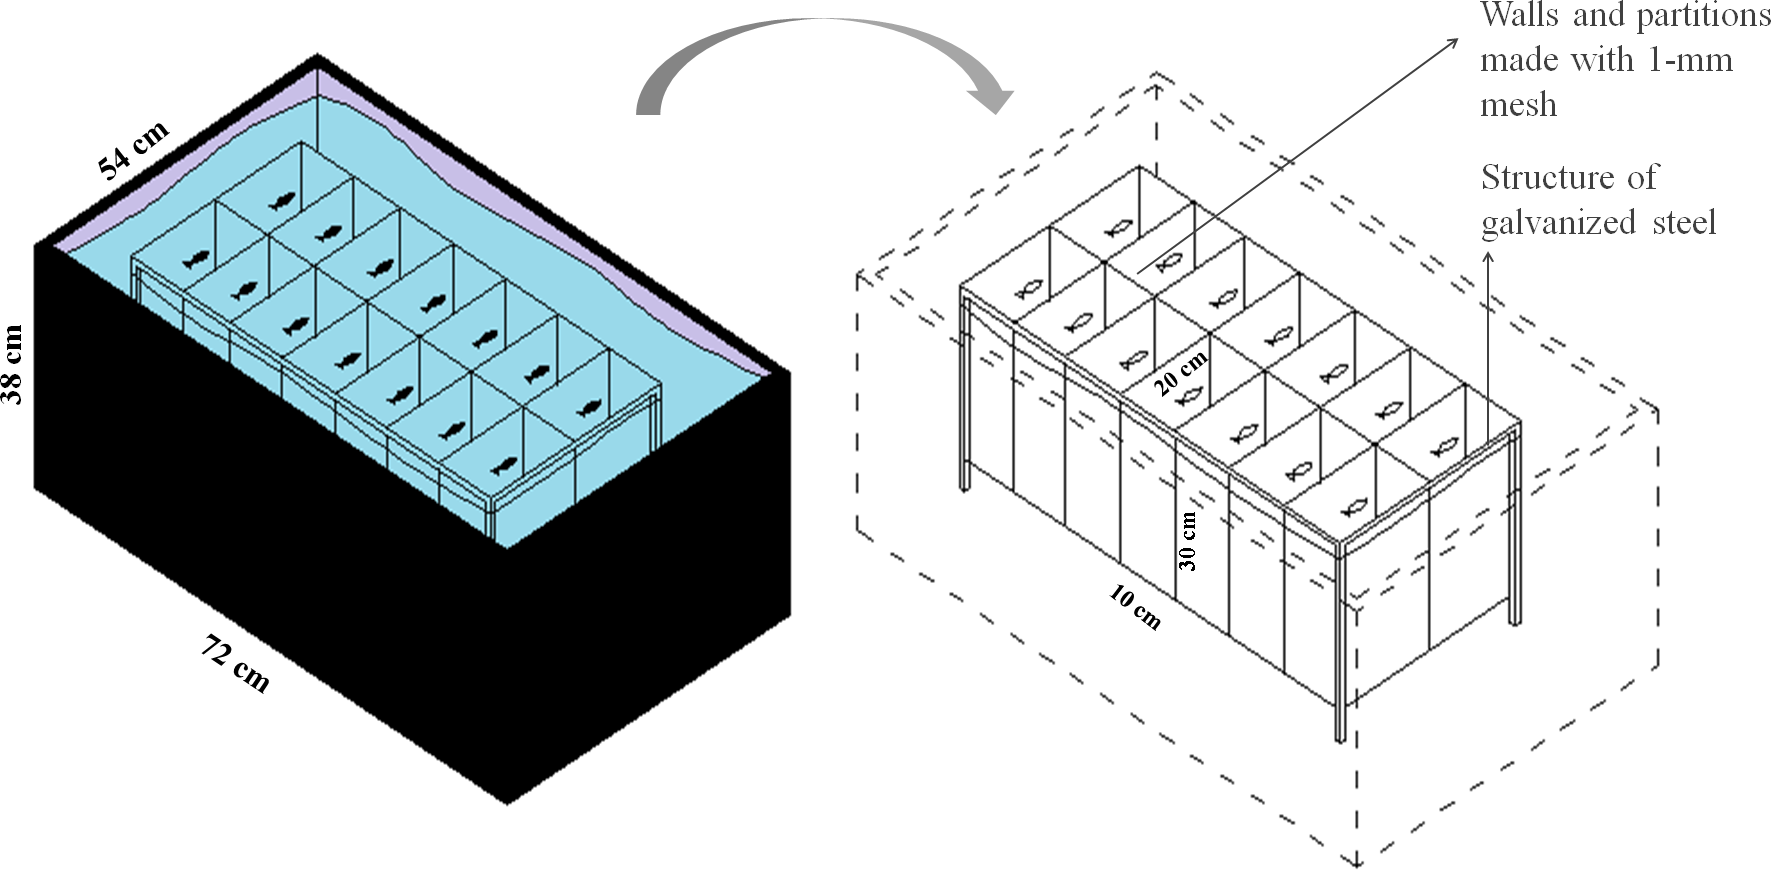 feeding regimen modulates zefish behavior [peerj] on taylor dunn  accelerator schematic,